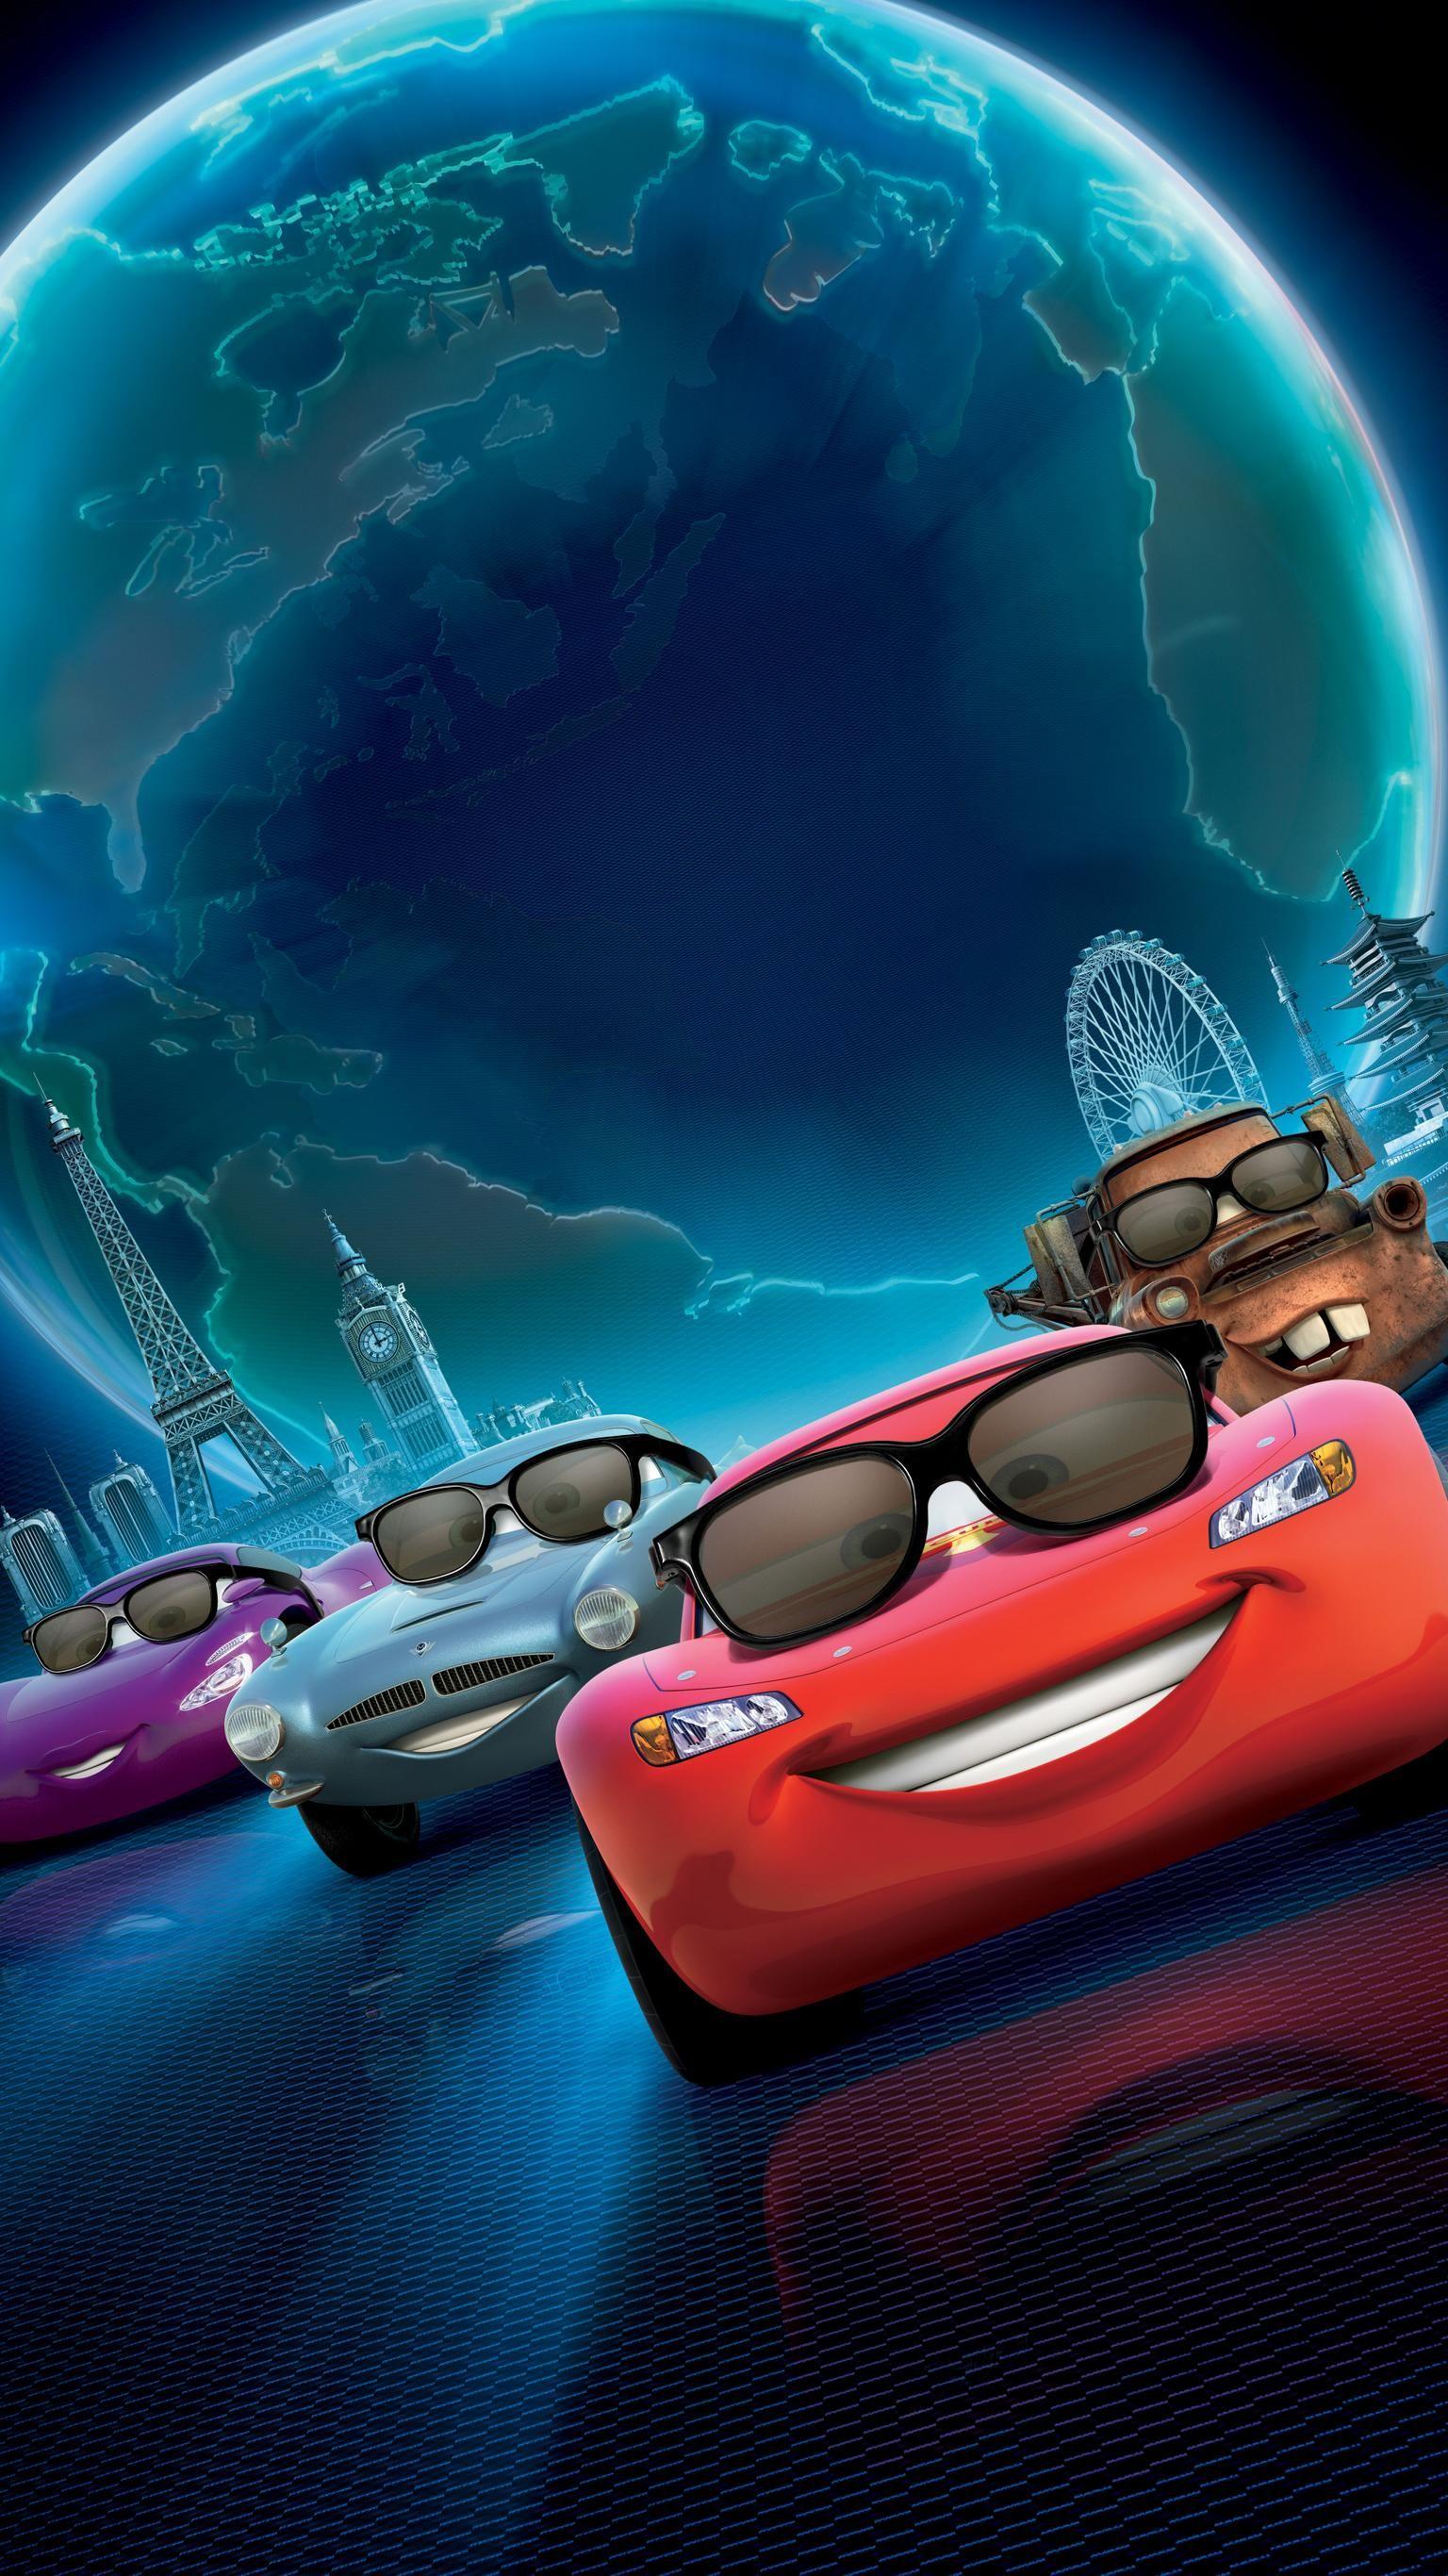 Cars 2 2011 Phone Wallpaper Moviemania Disney Cars Movie Disney Cars Movie Wallpapers [ 2732 x 1536 Pixel ]